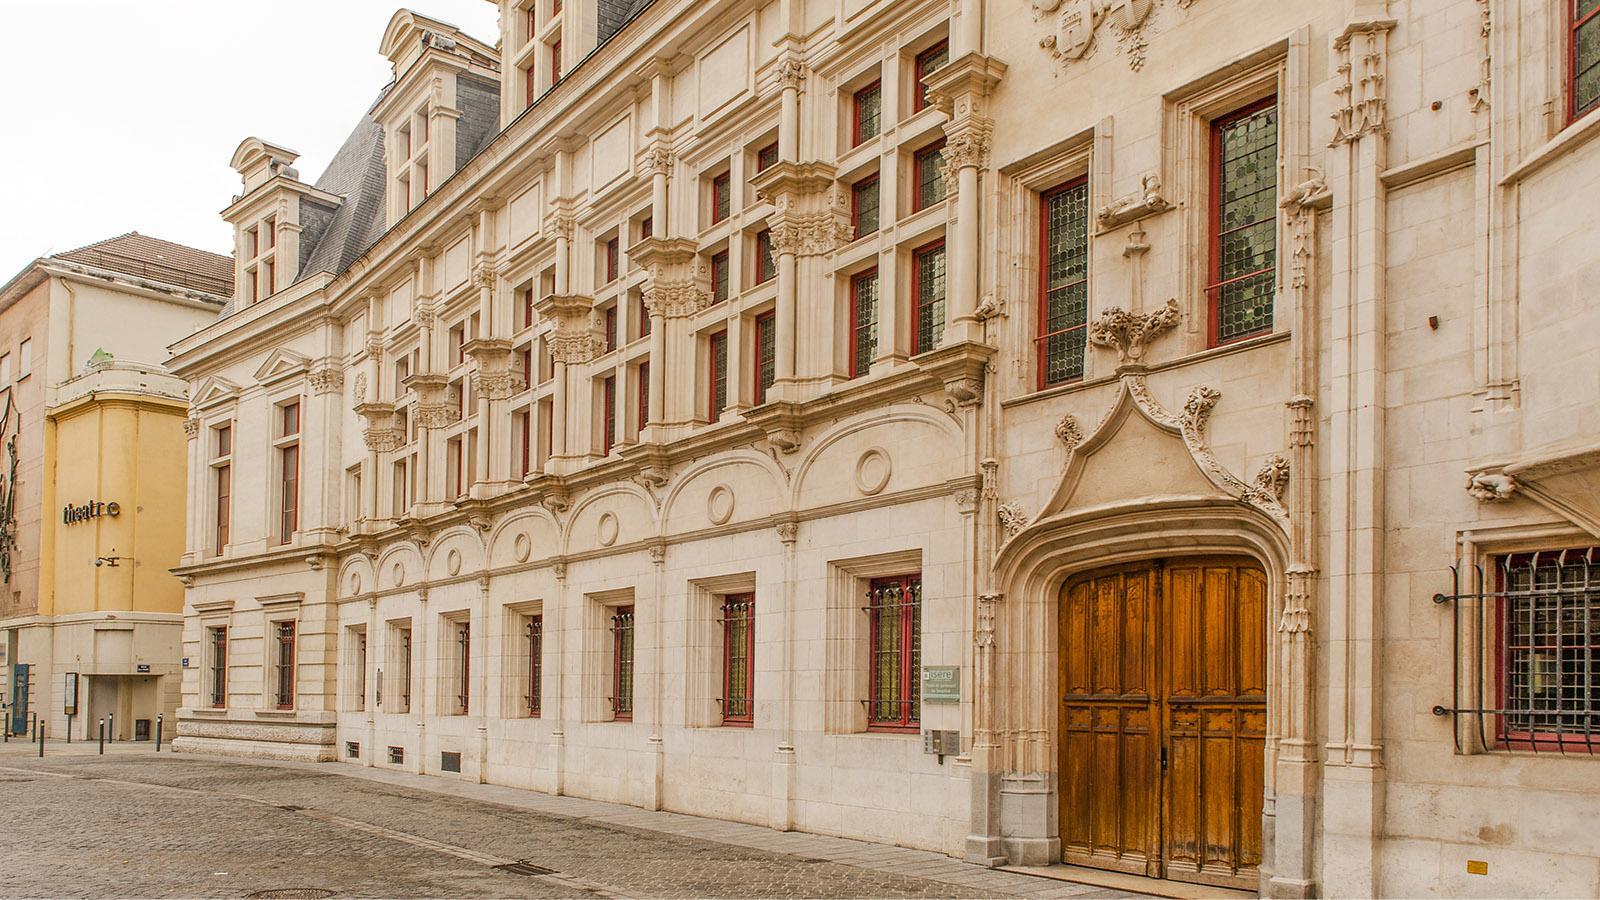 Der Ancien Palais du Parlement von Grenoble. Foto: Hilke Maunder